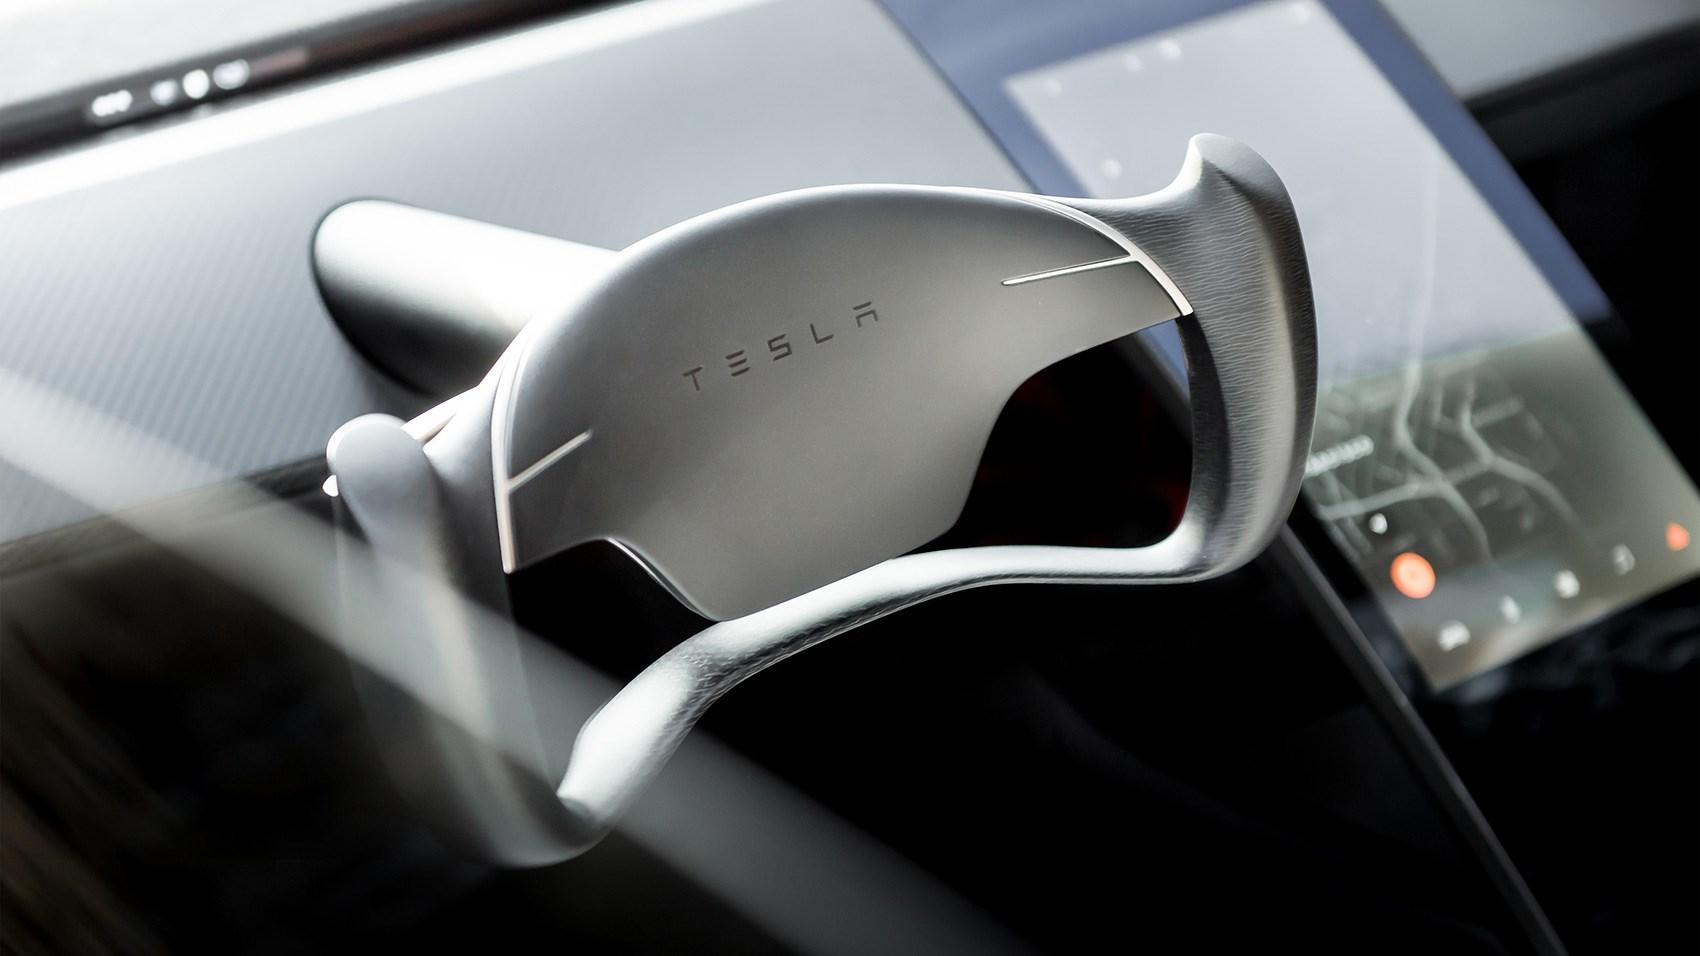 Tesla roadster review uk dating